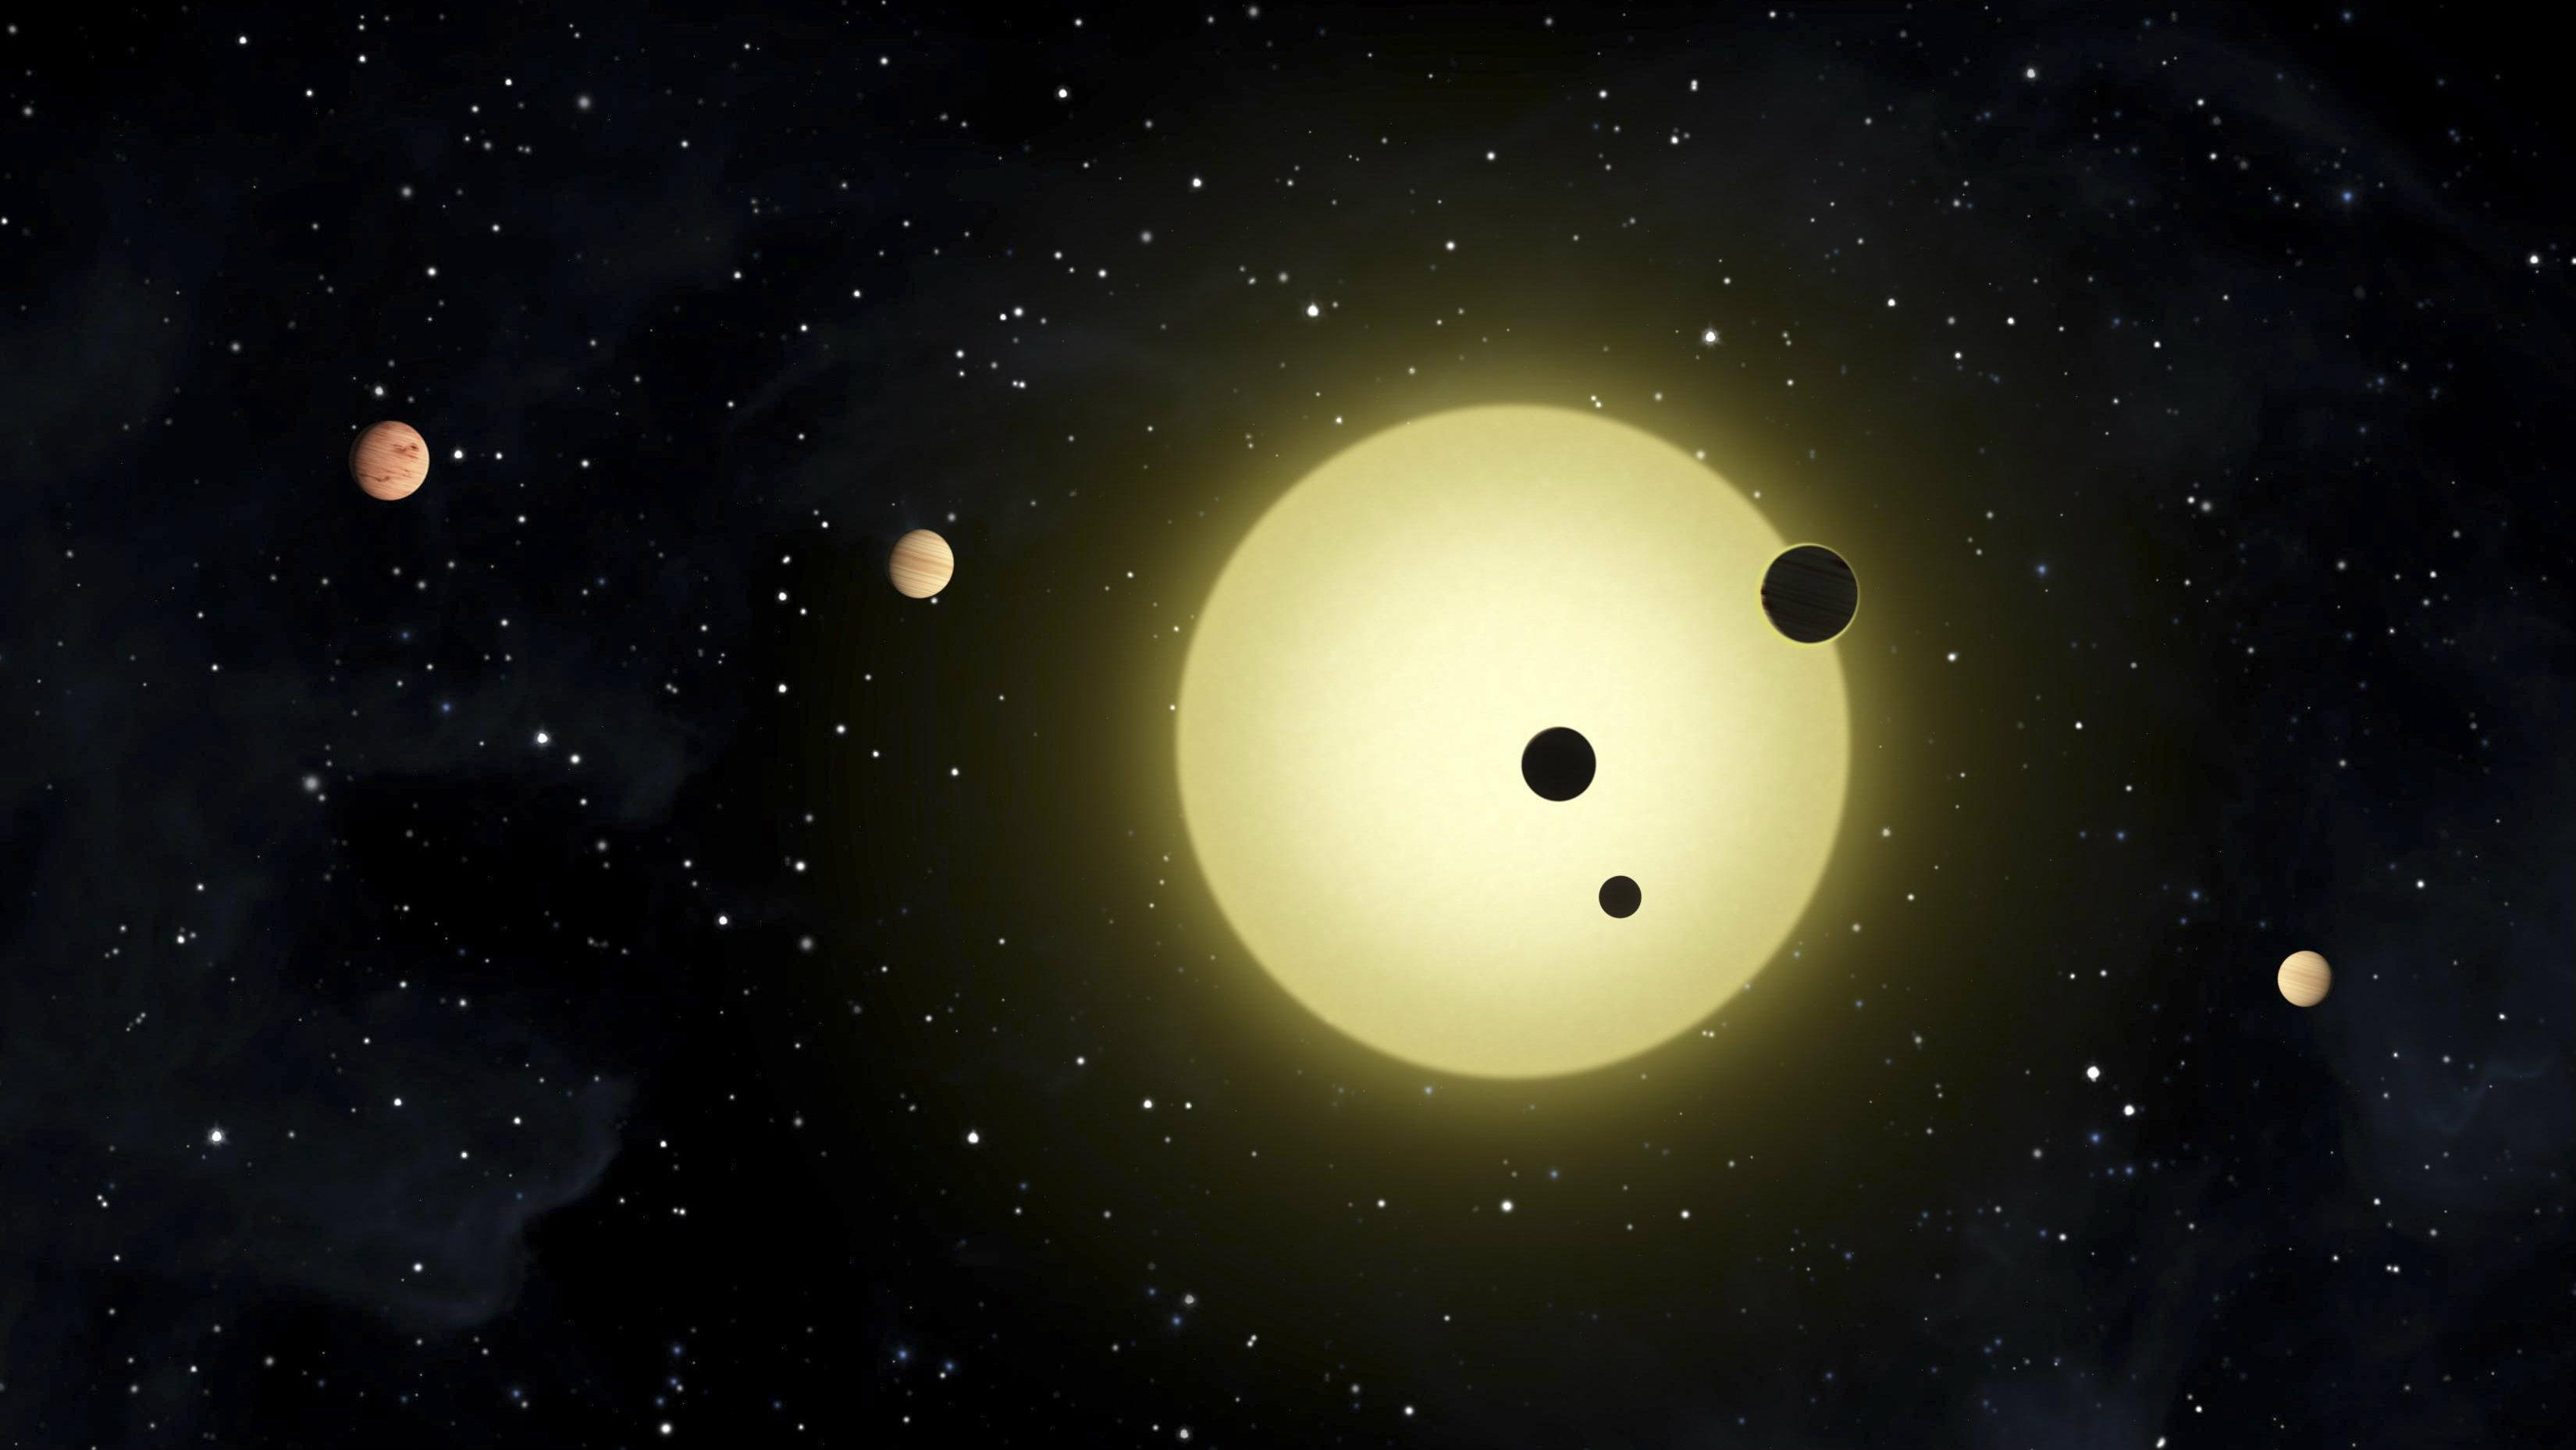 planets around a star